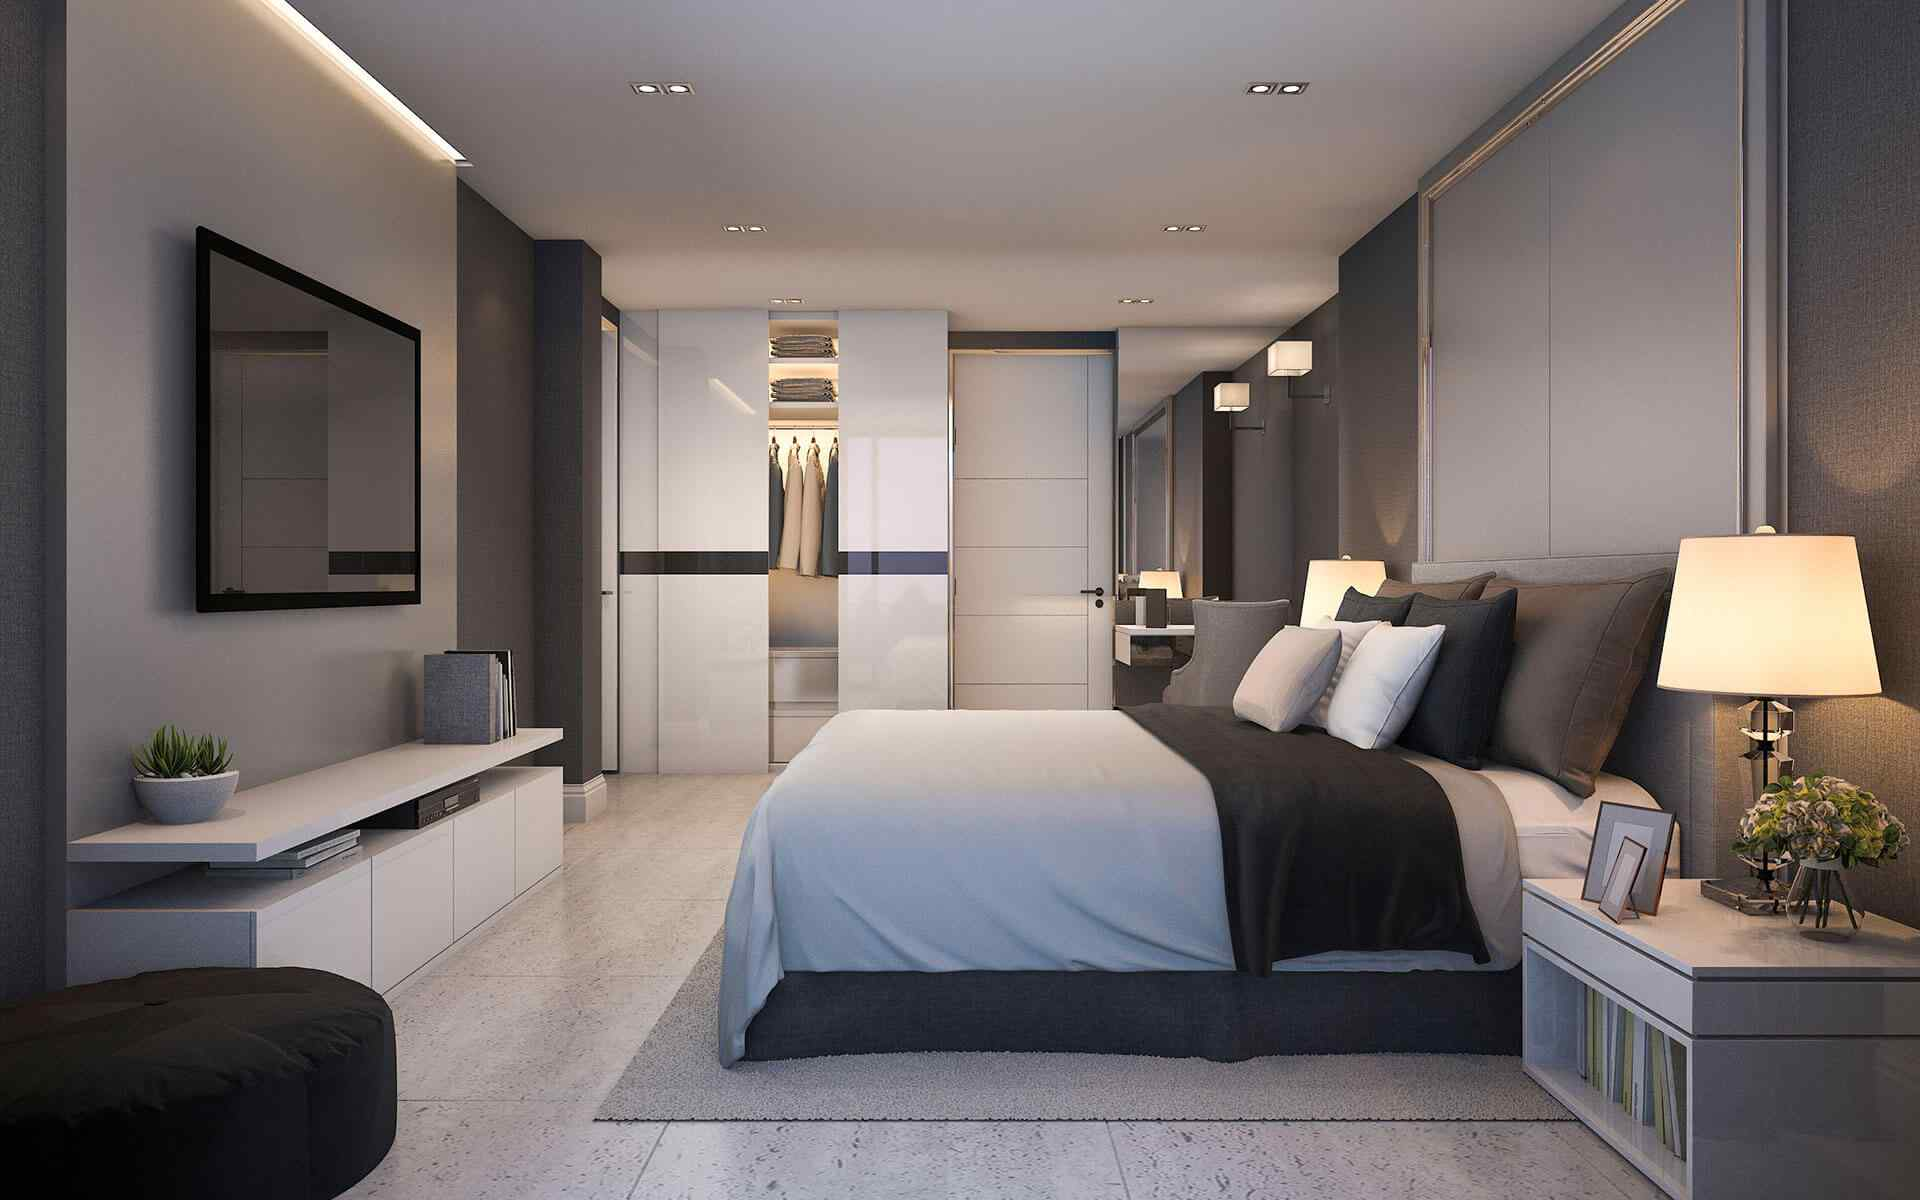 https://apartamentymarinaborki.pl/wp-content/uploads/2020/01/slider_single_project_3.jpg